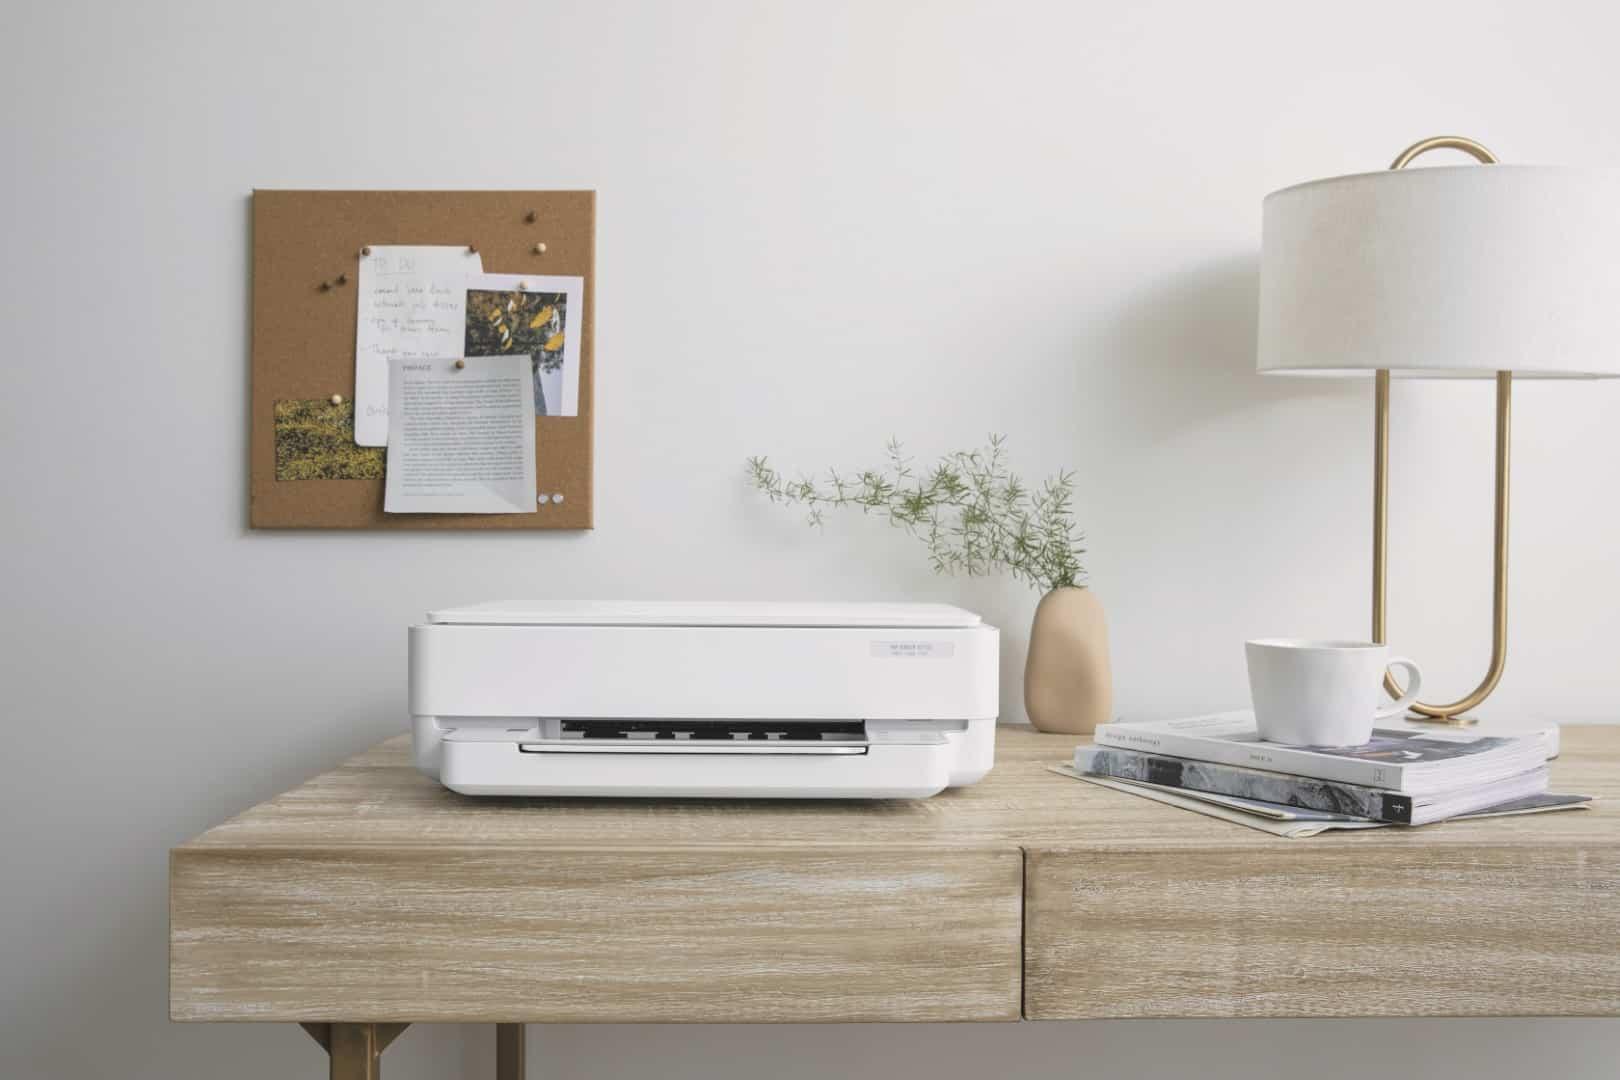 HP Envy HomeOffice EnvyPro - 00150